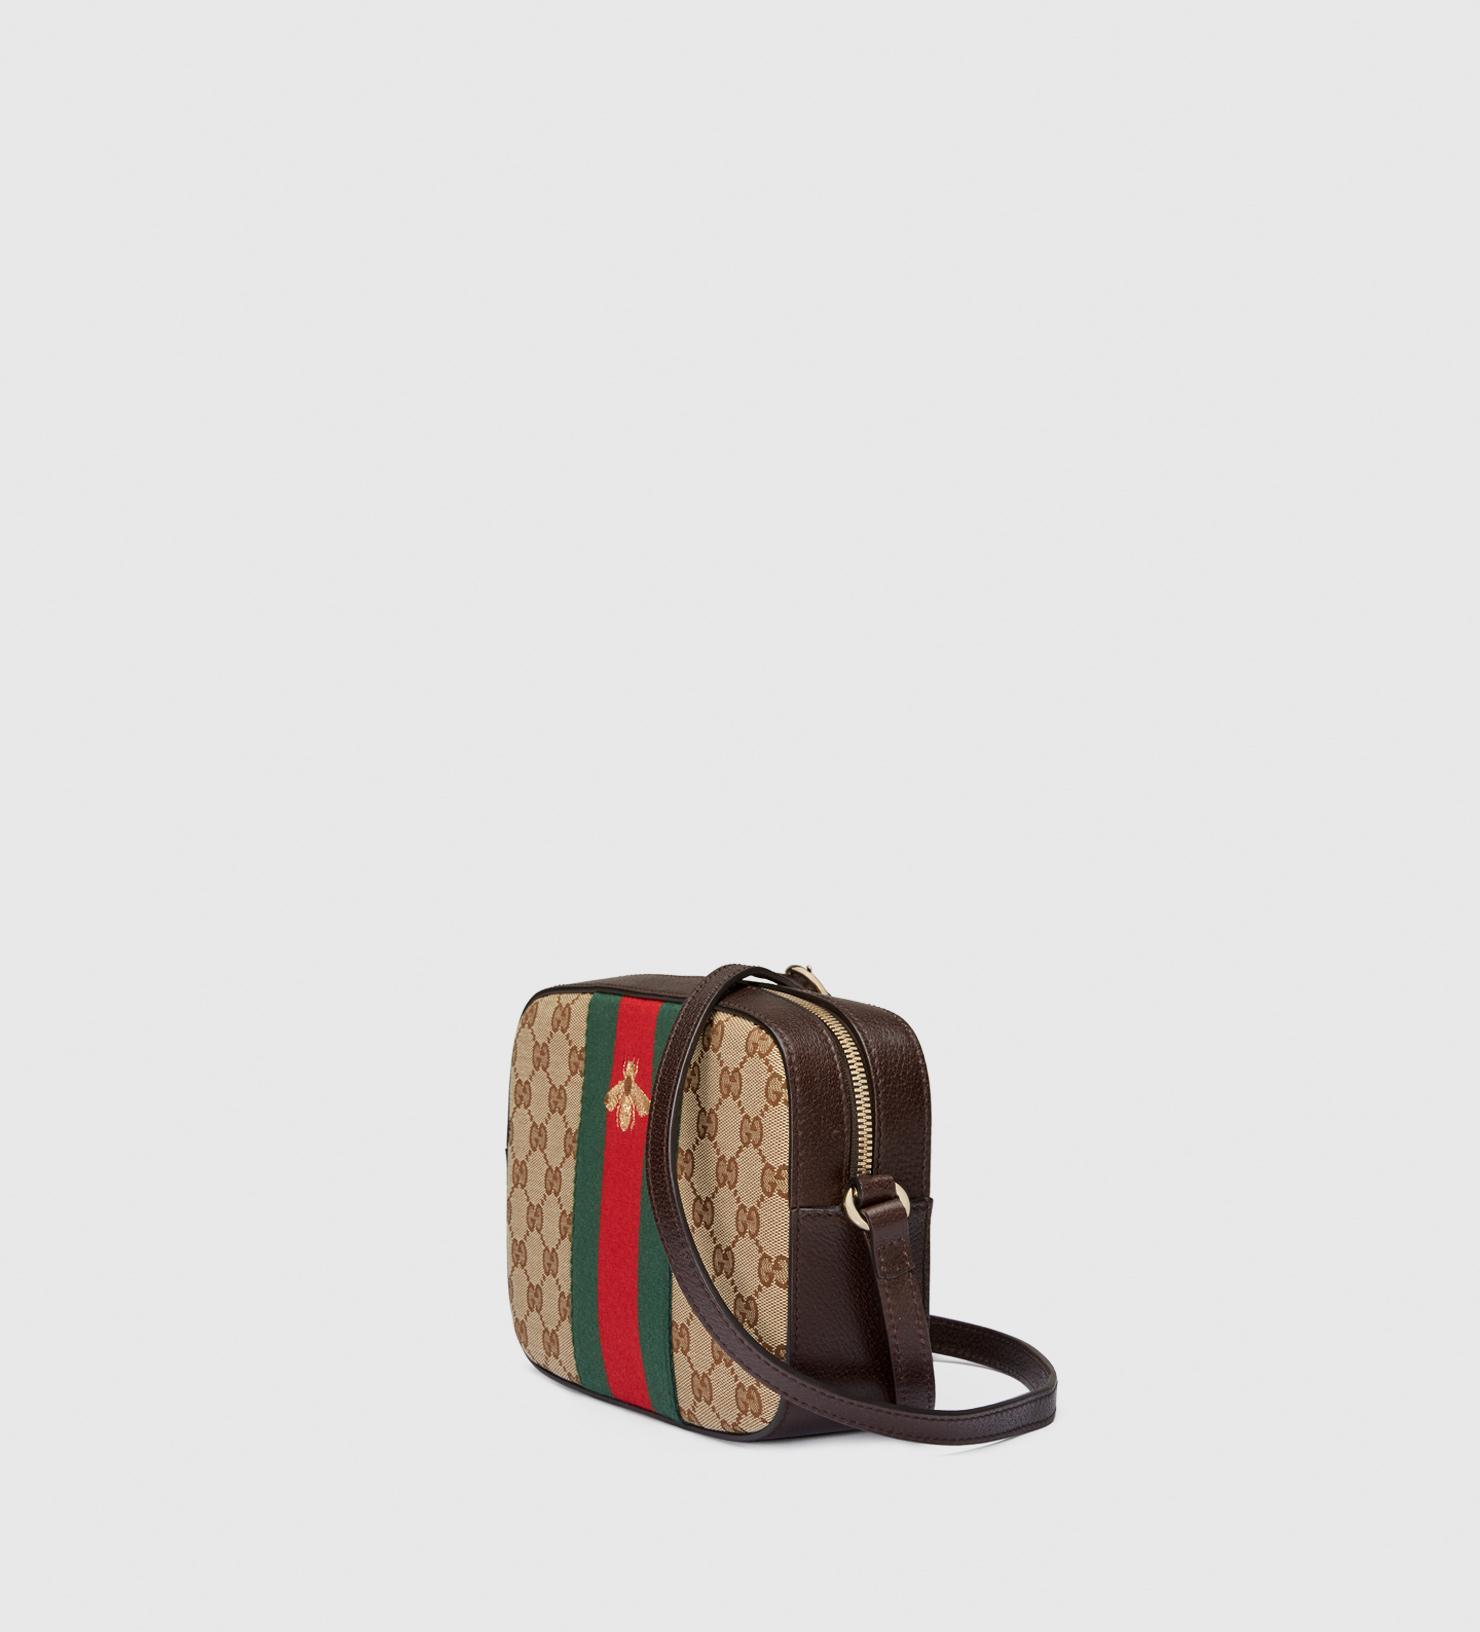 1a5e38fe67b Gucci Original Gg Canvas Shoulder Bag in Red - Lyst